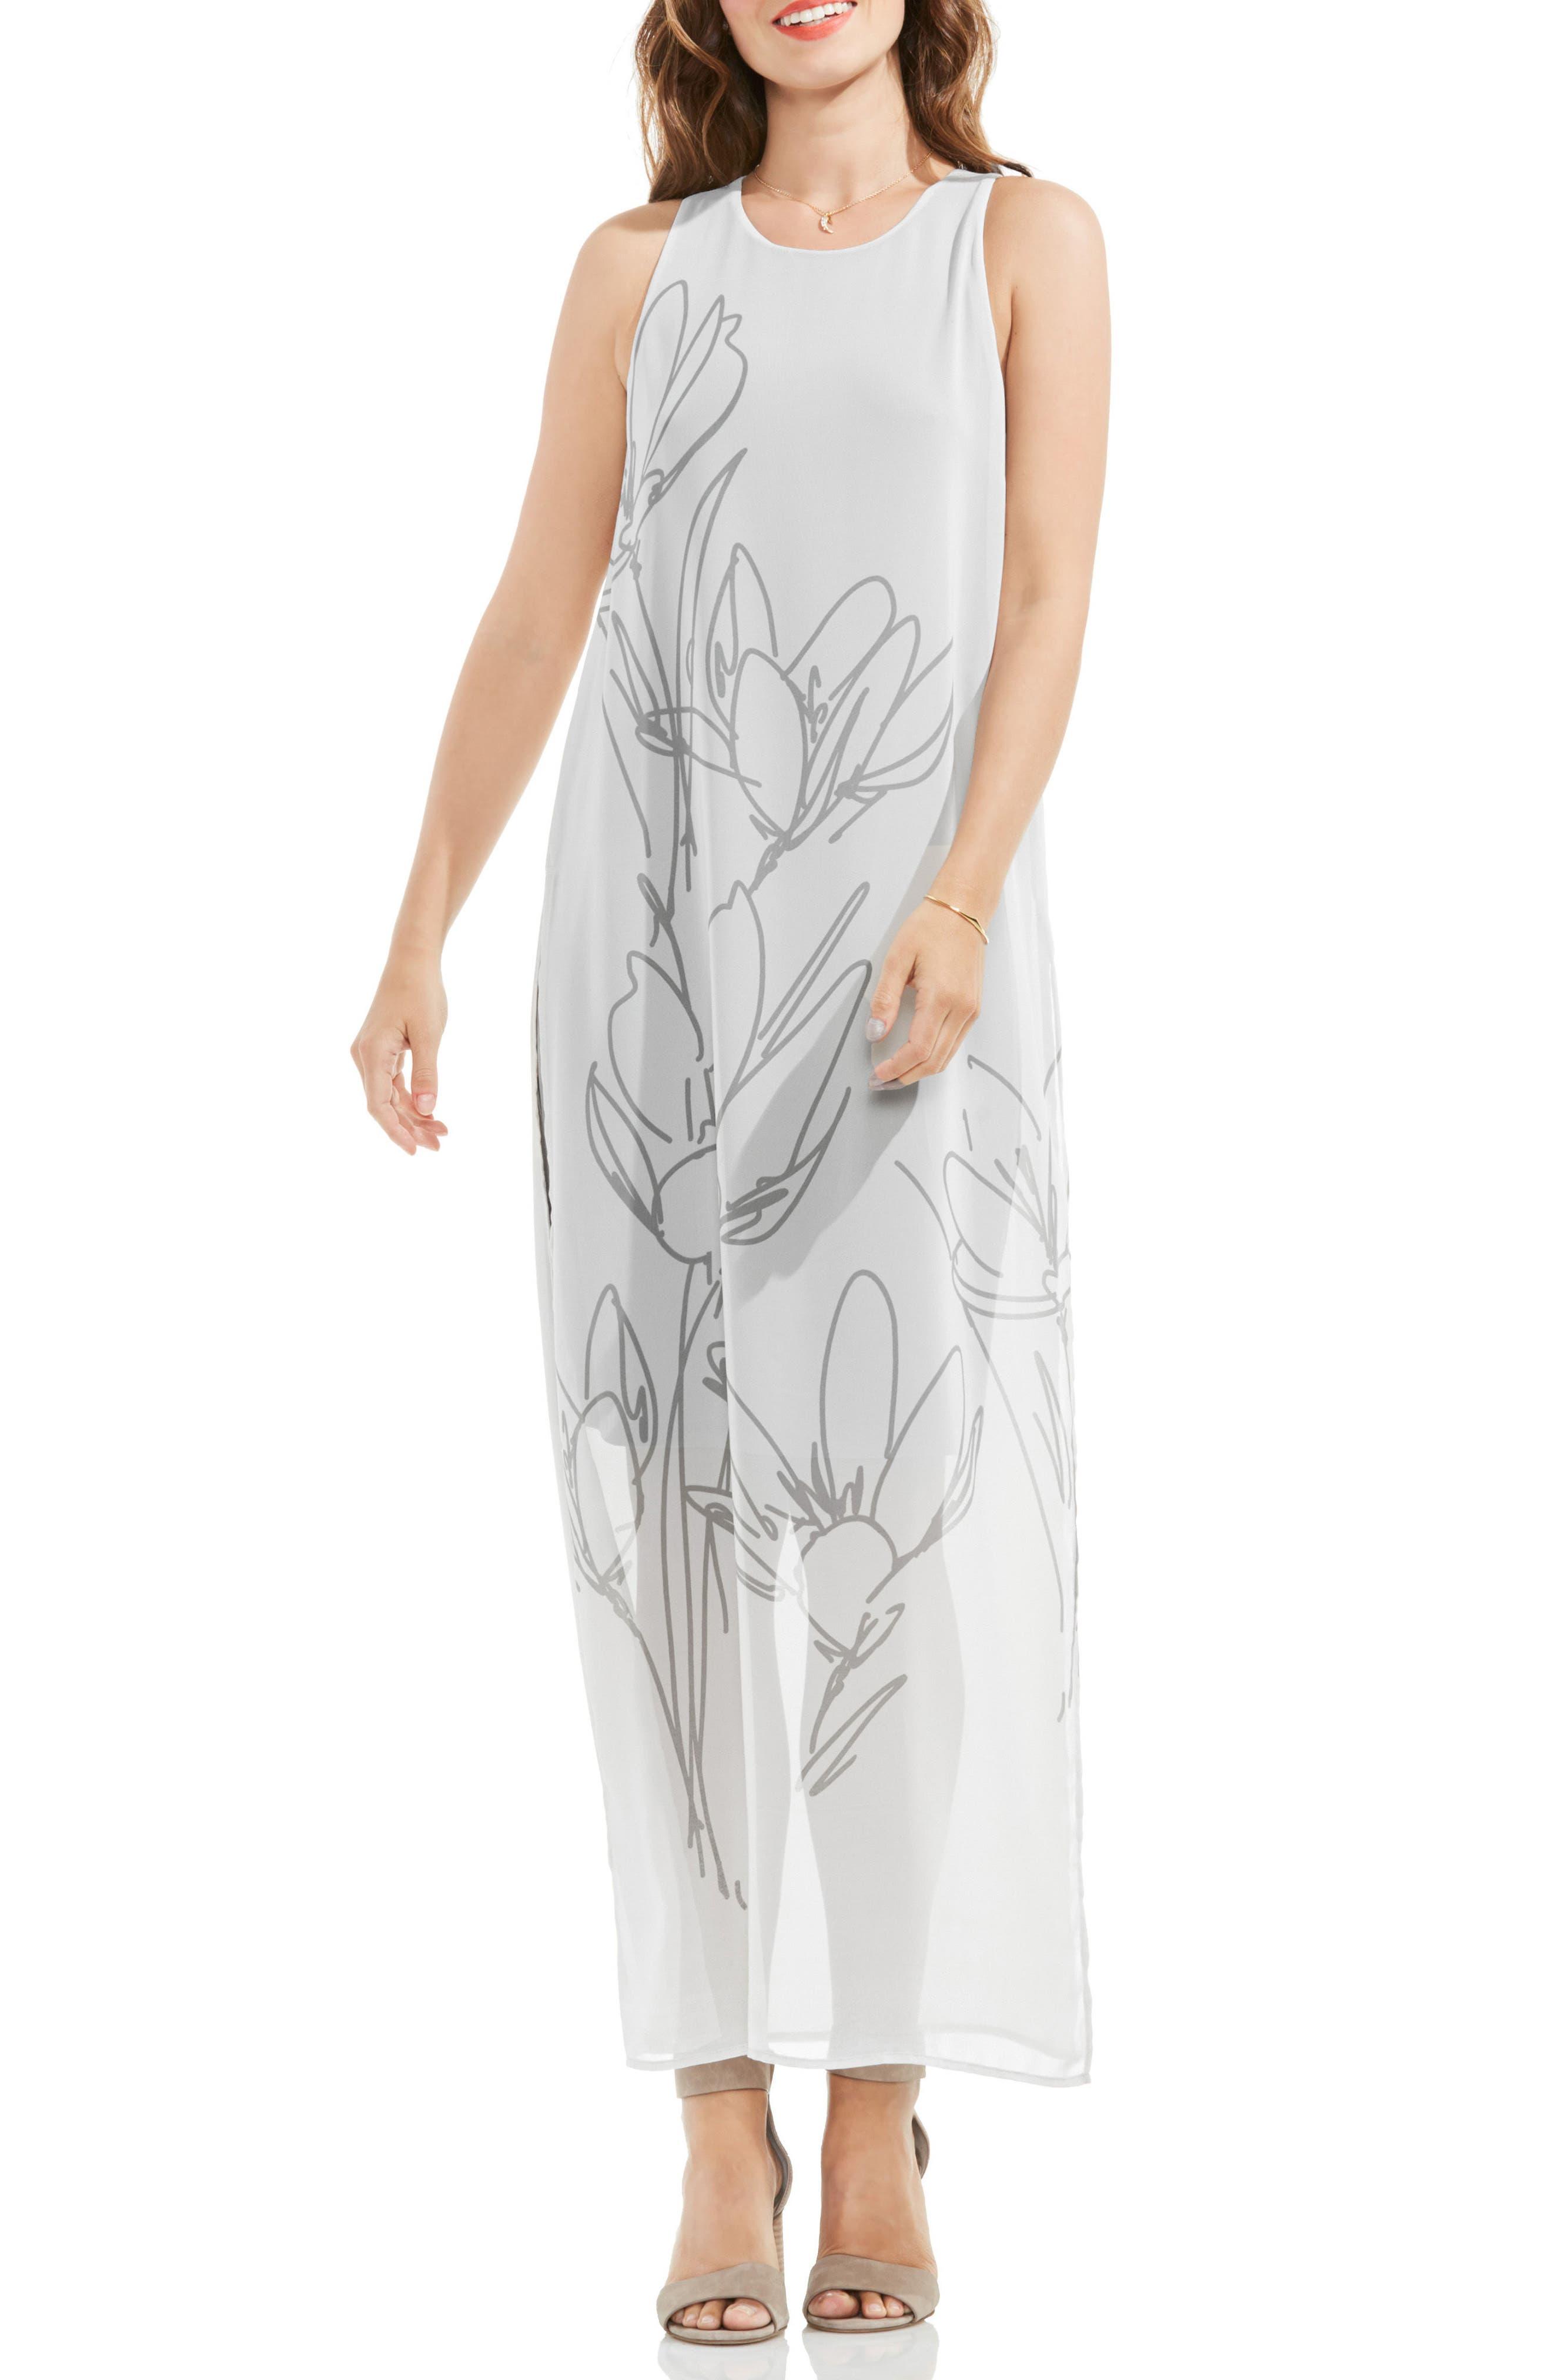 VINCE CAMUTO Fluent Cluster Maxi Dress